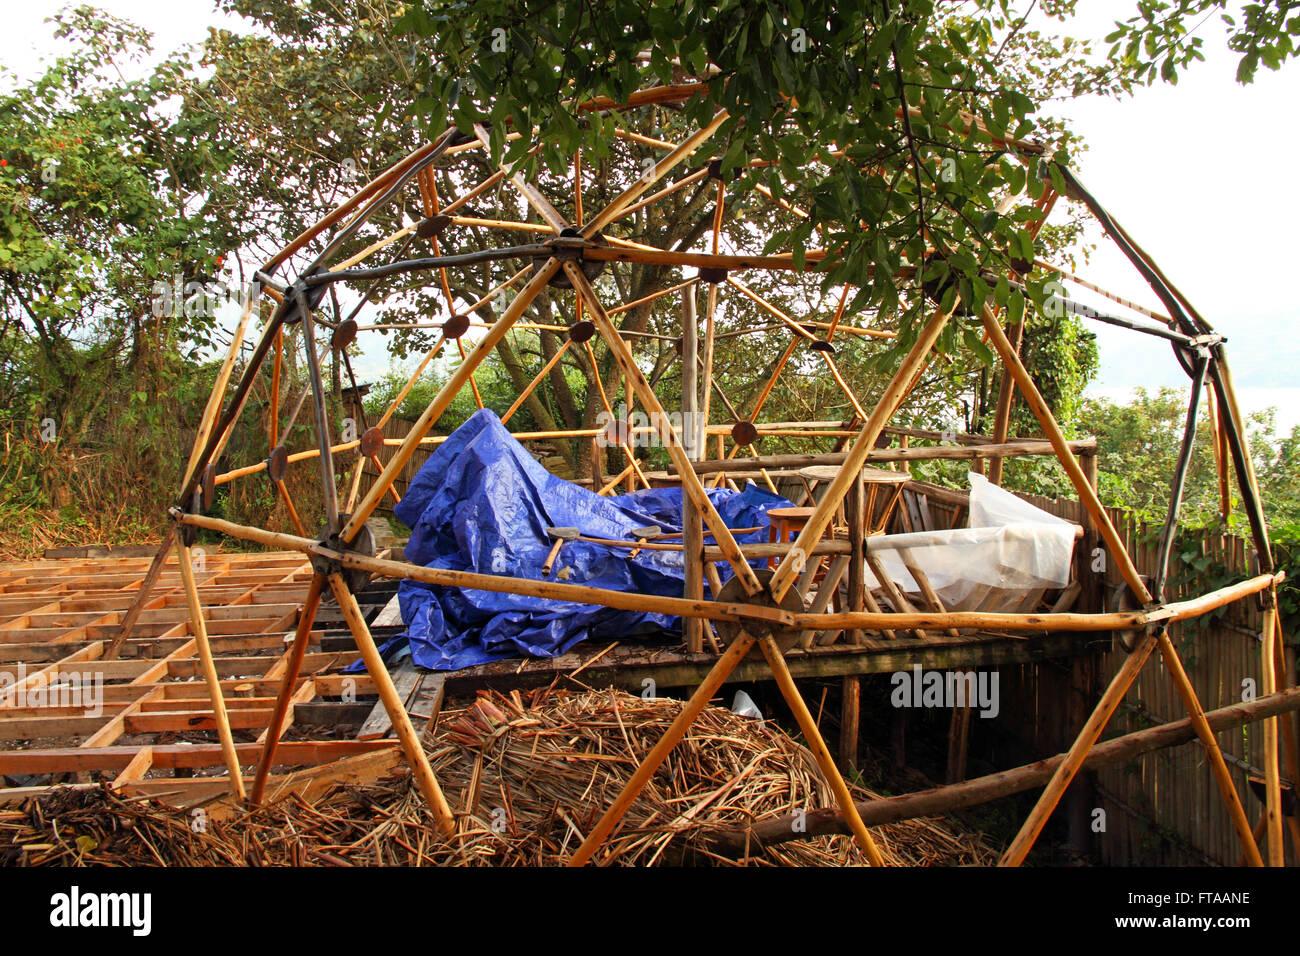 build a tent stockfotos build a tent bilder alamy. Black Bedroom Furniture Sets. Home Design Ideas